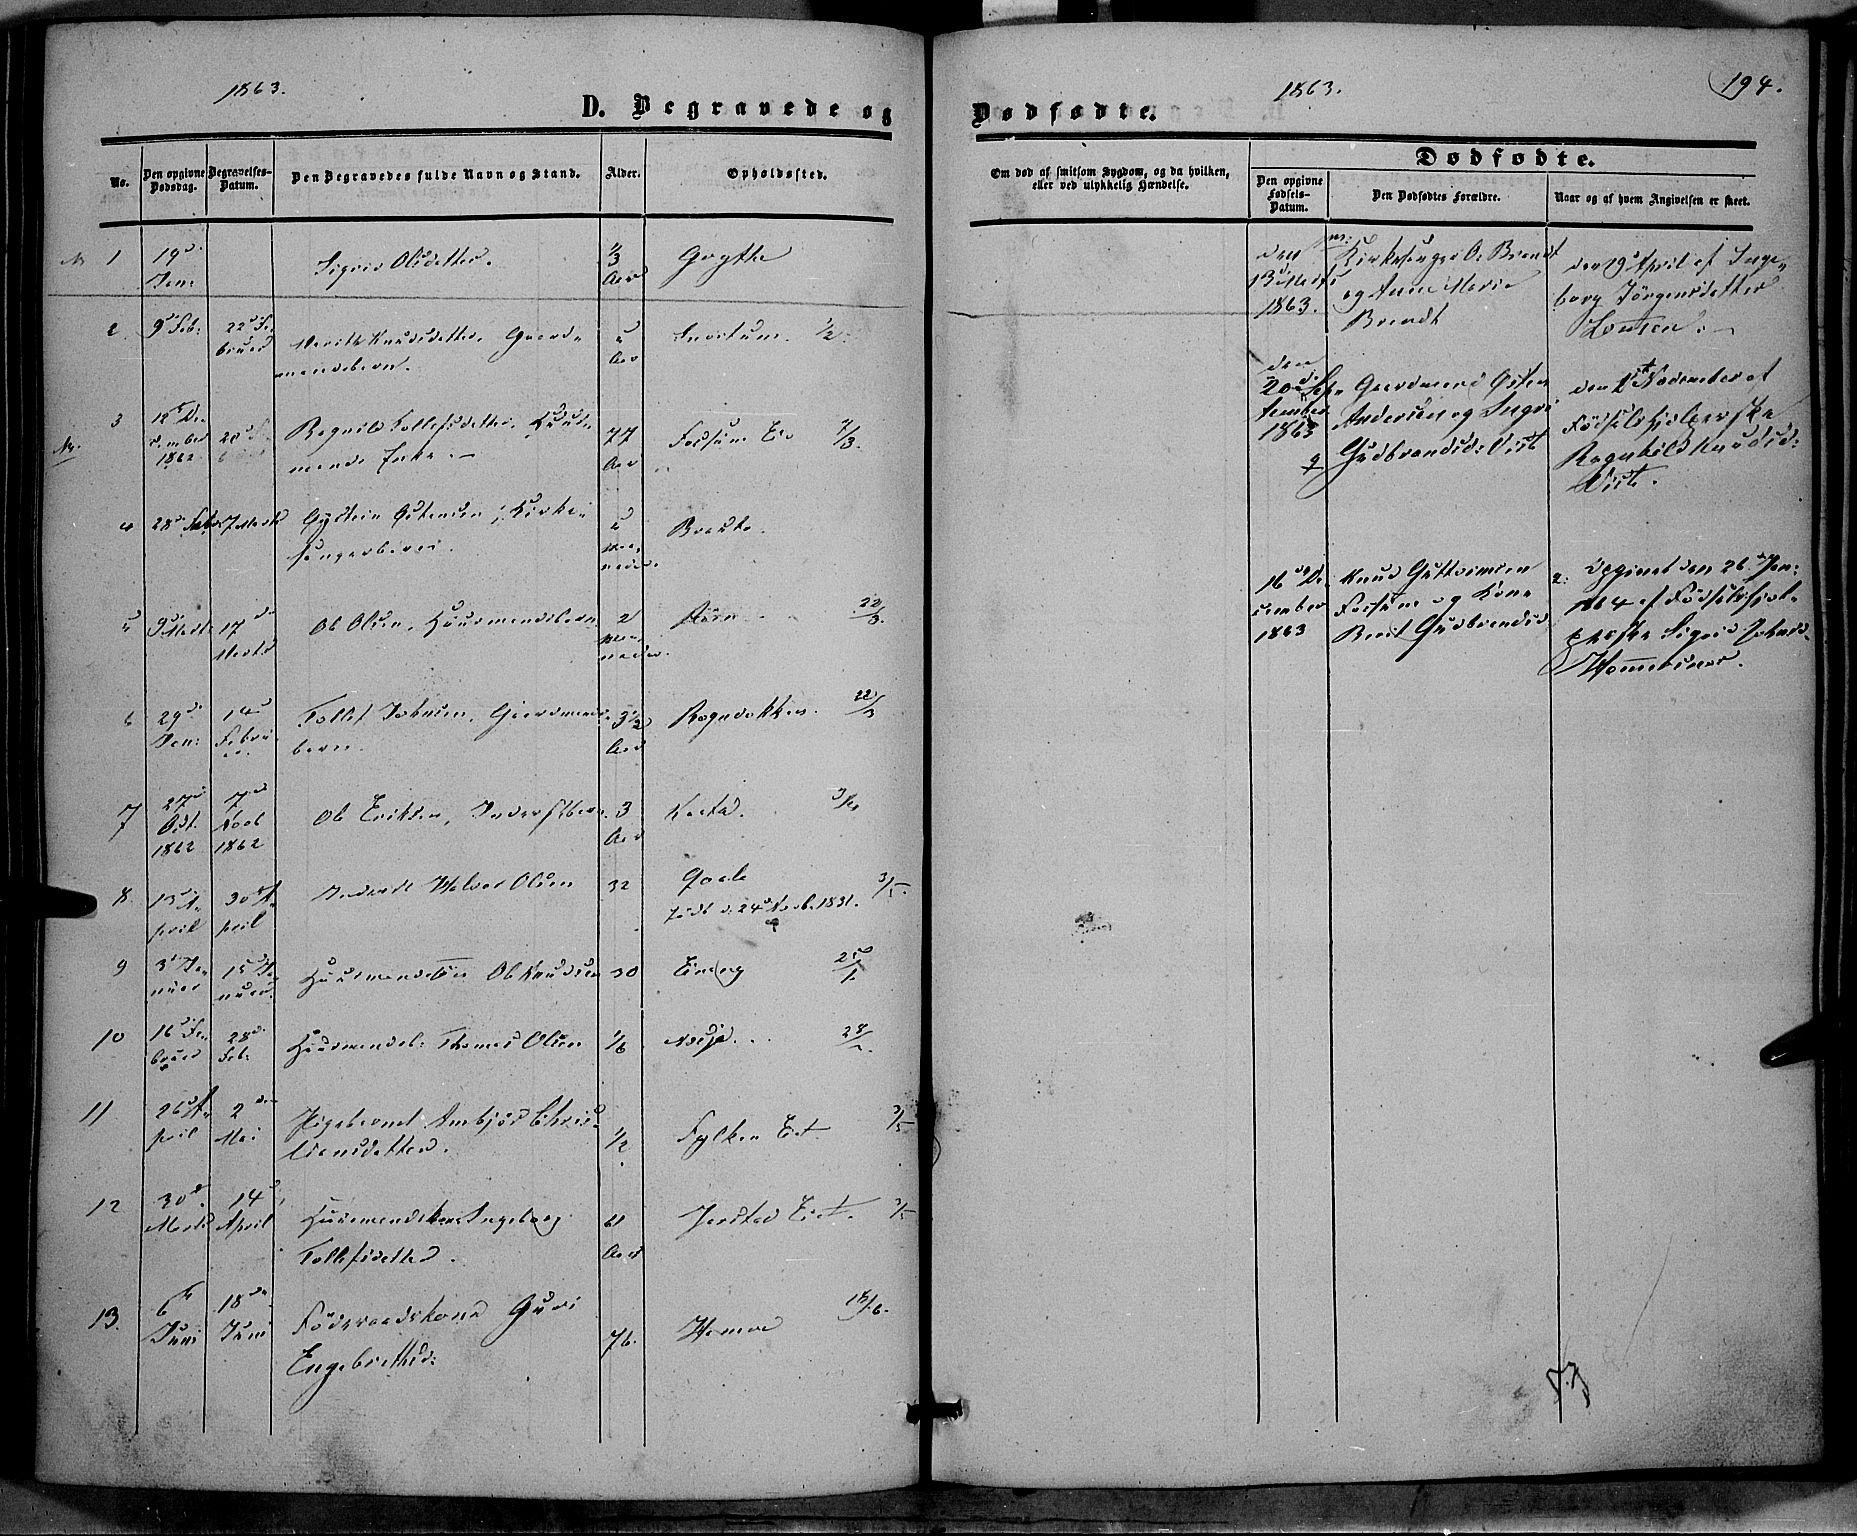 SAH, Vestre Slidre prestekontor, Ministerialbok nr. 2, 1856-1864, s. 194